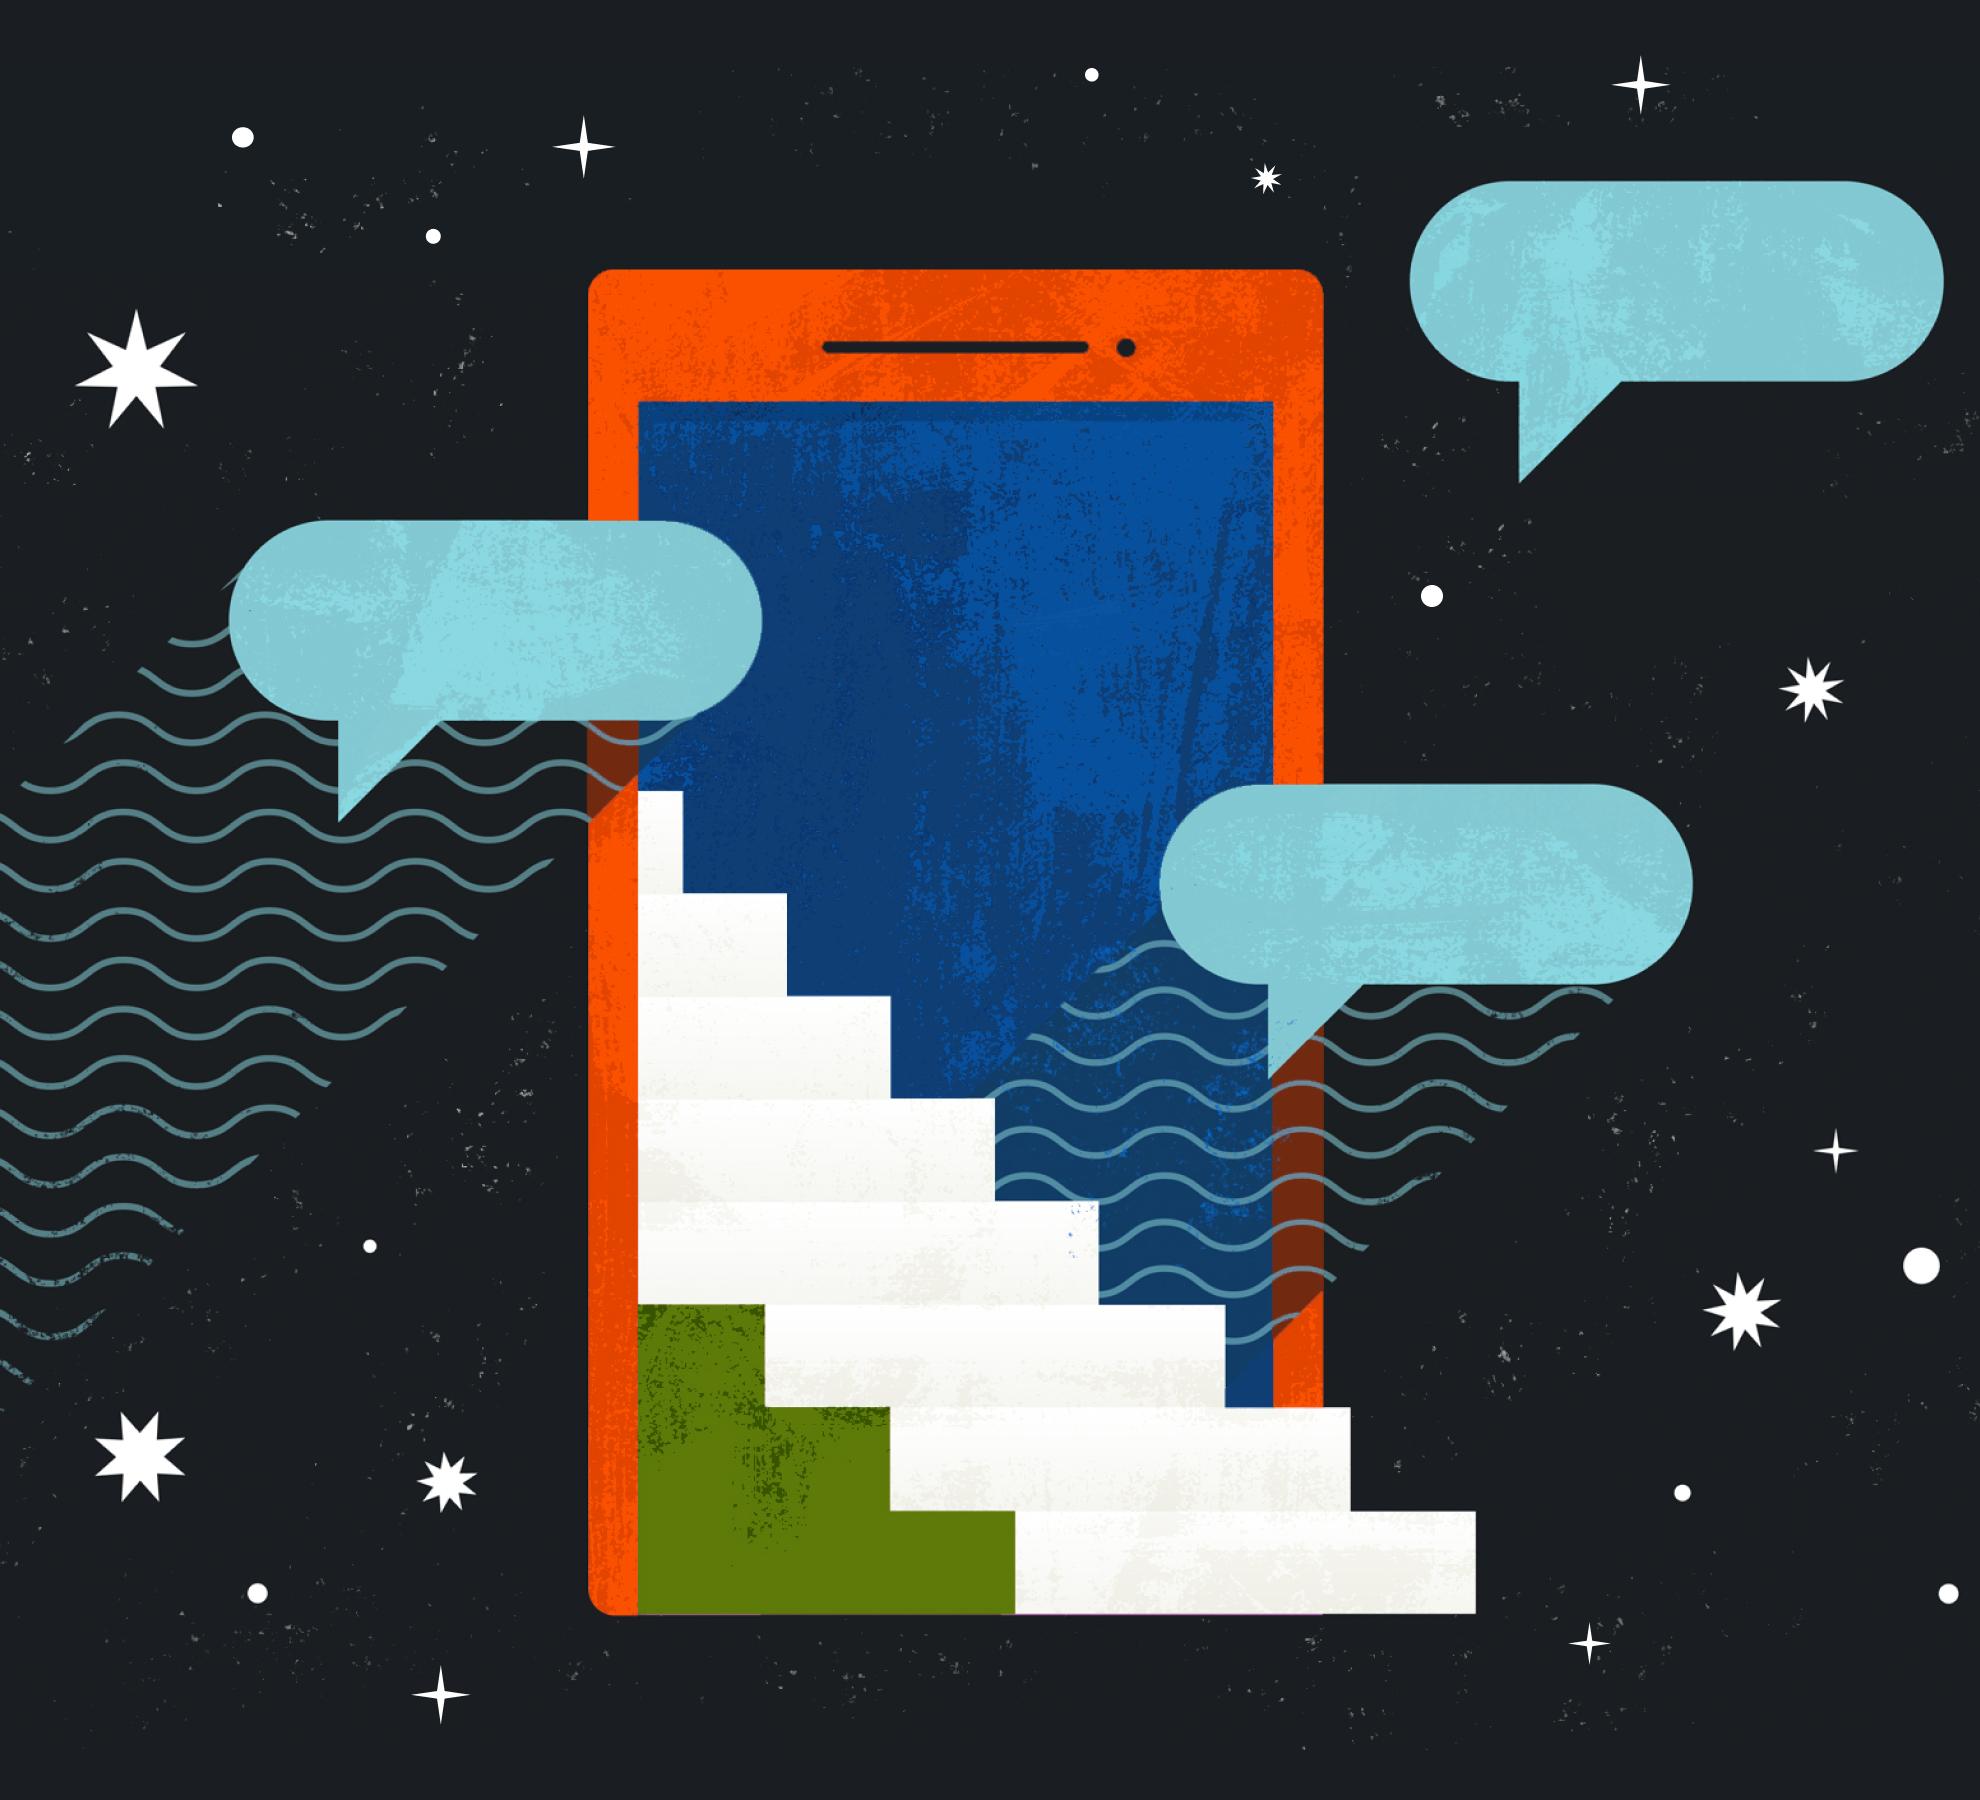 Outlook futuristic phone illustration